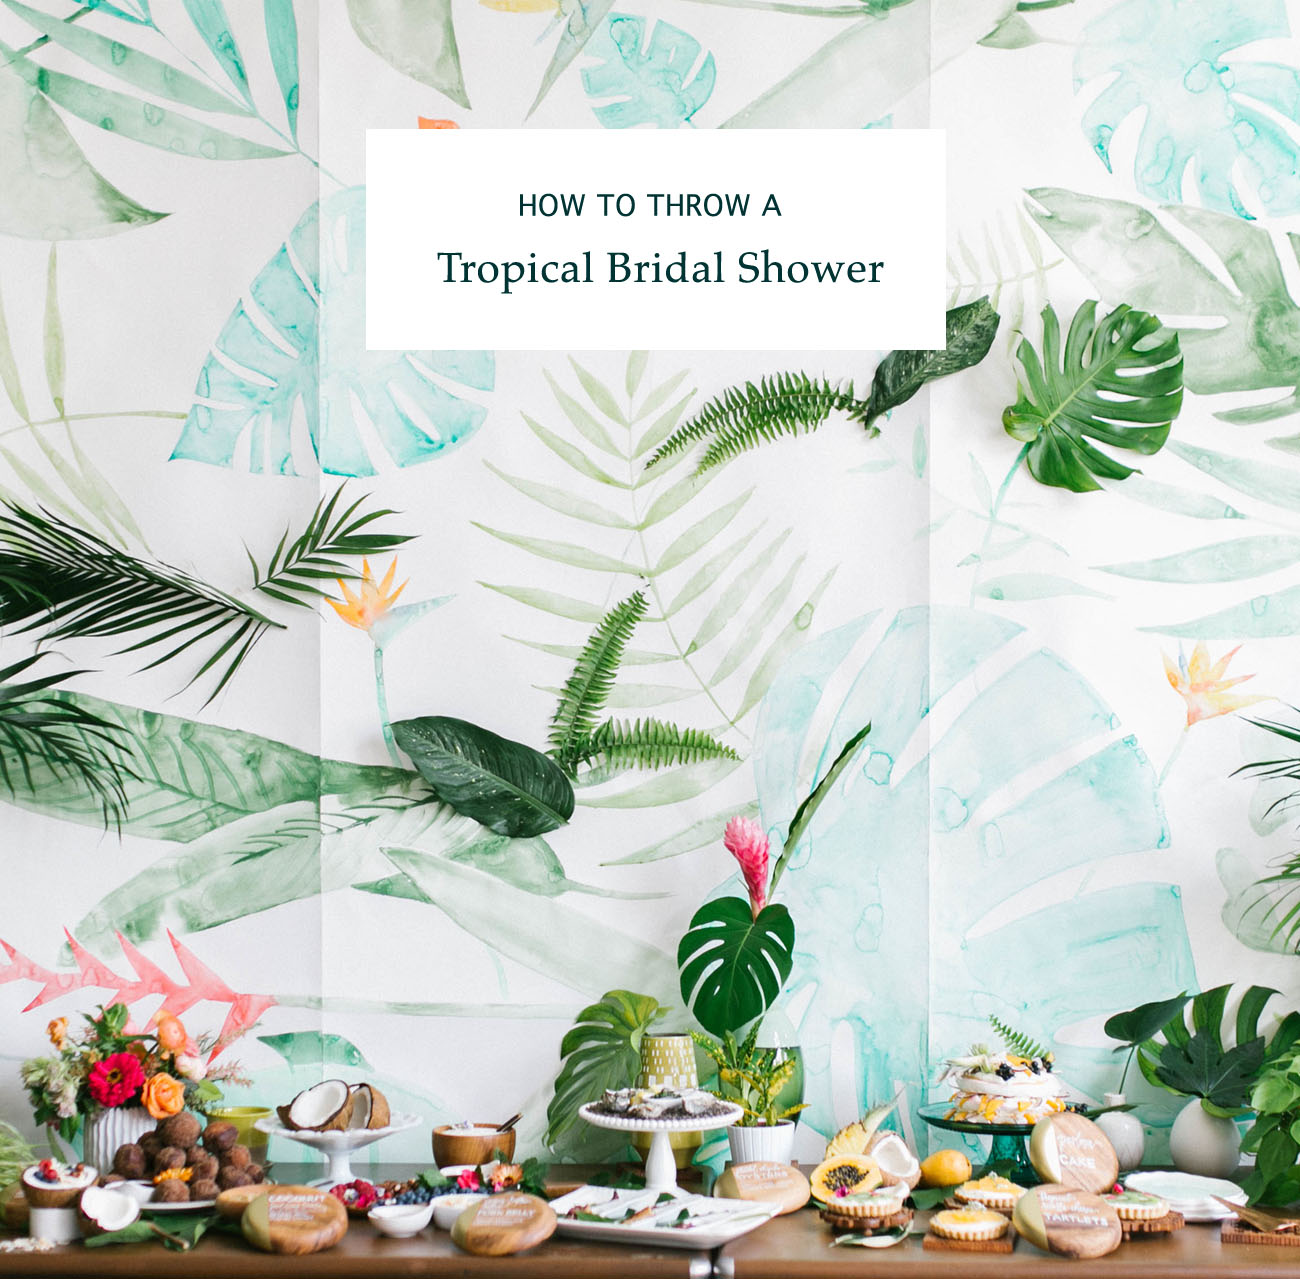 Tropical Bridal Shower